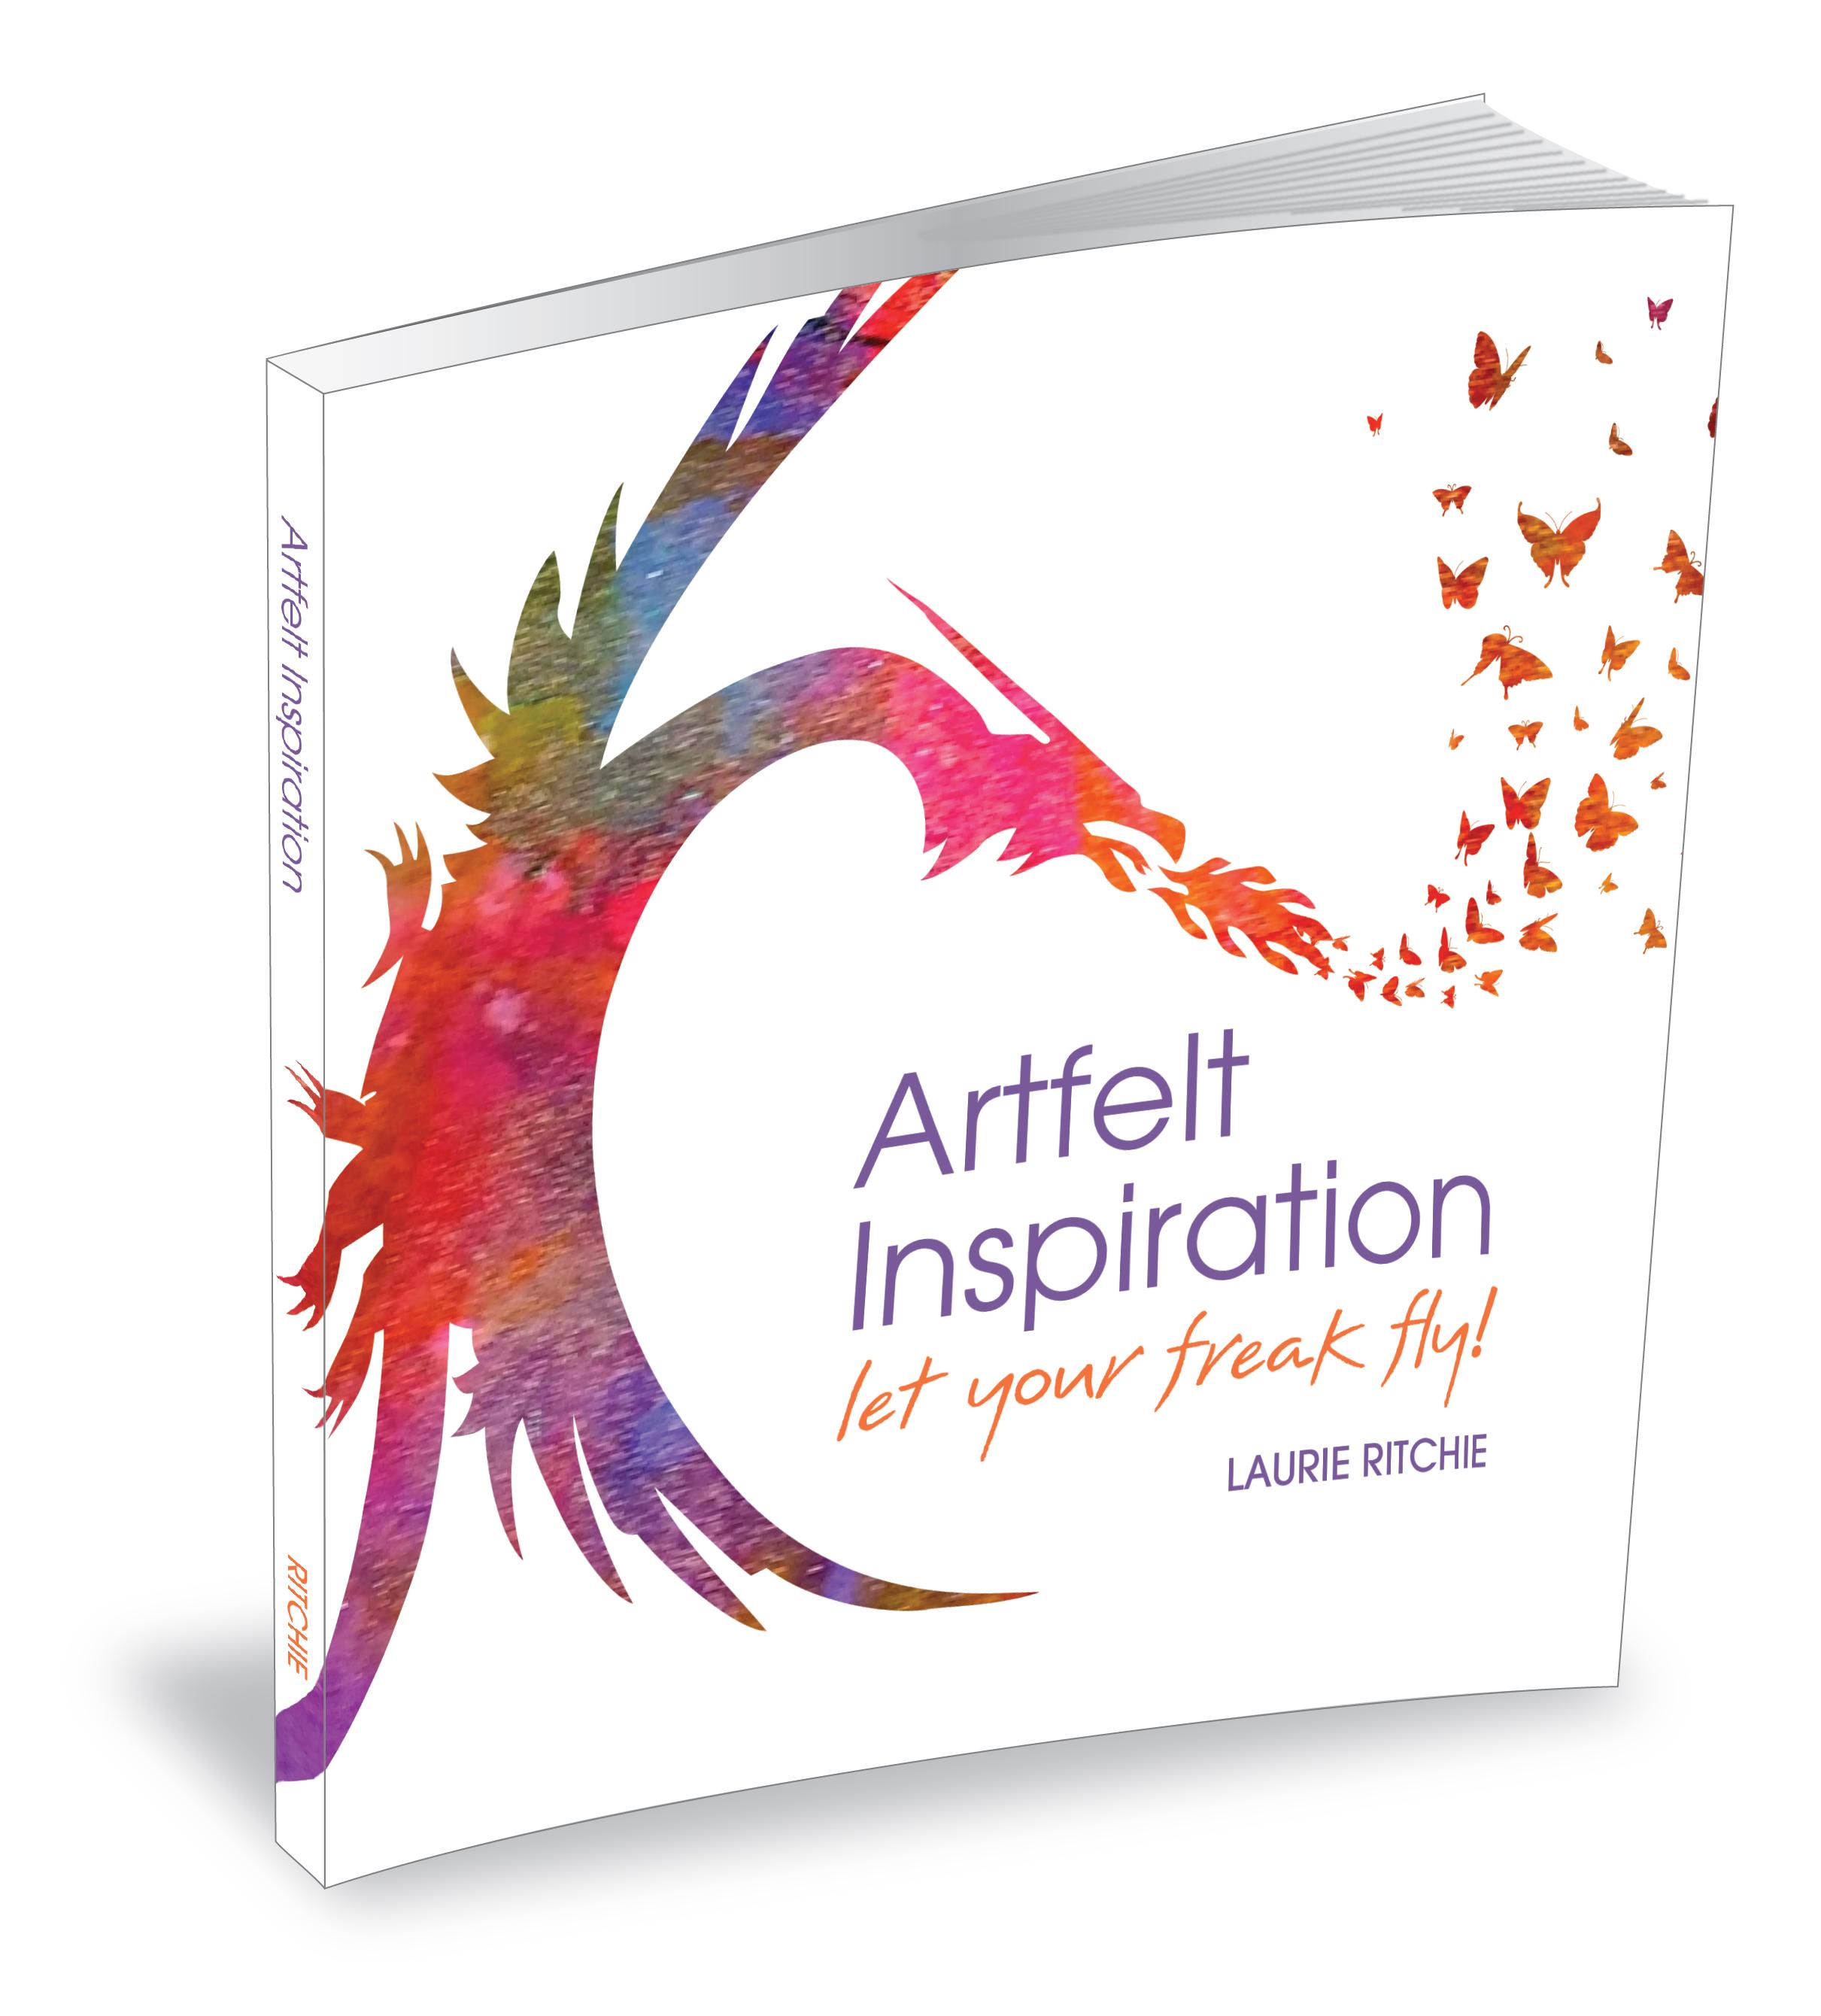 Artfelt Inspiration 3-D Art_RGB_300.jpg